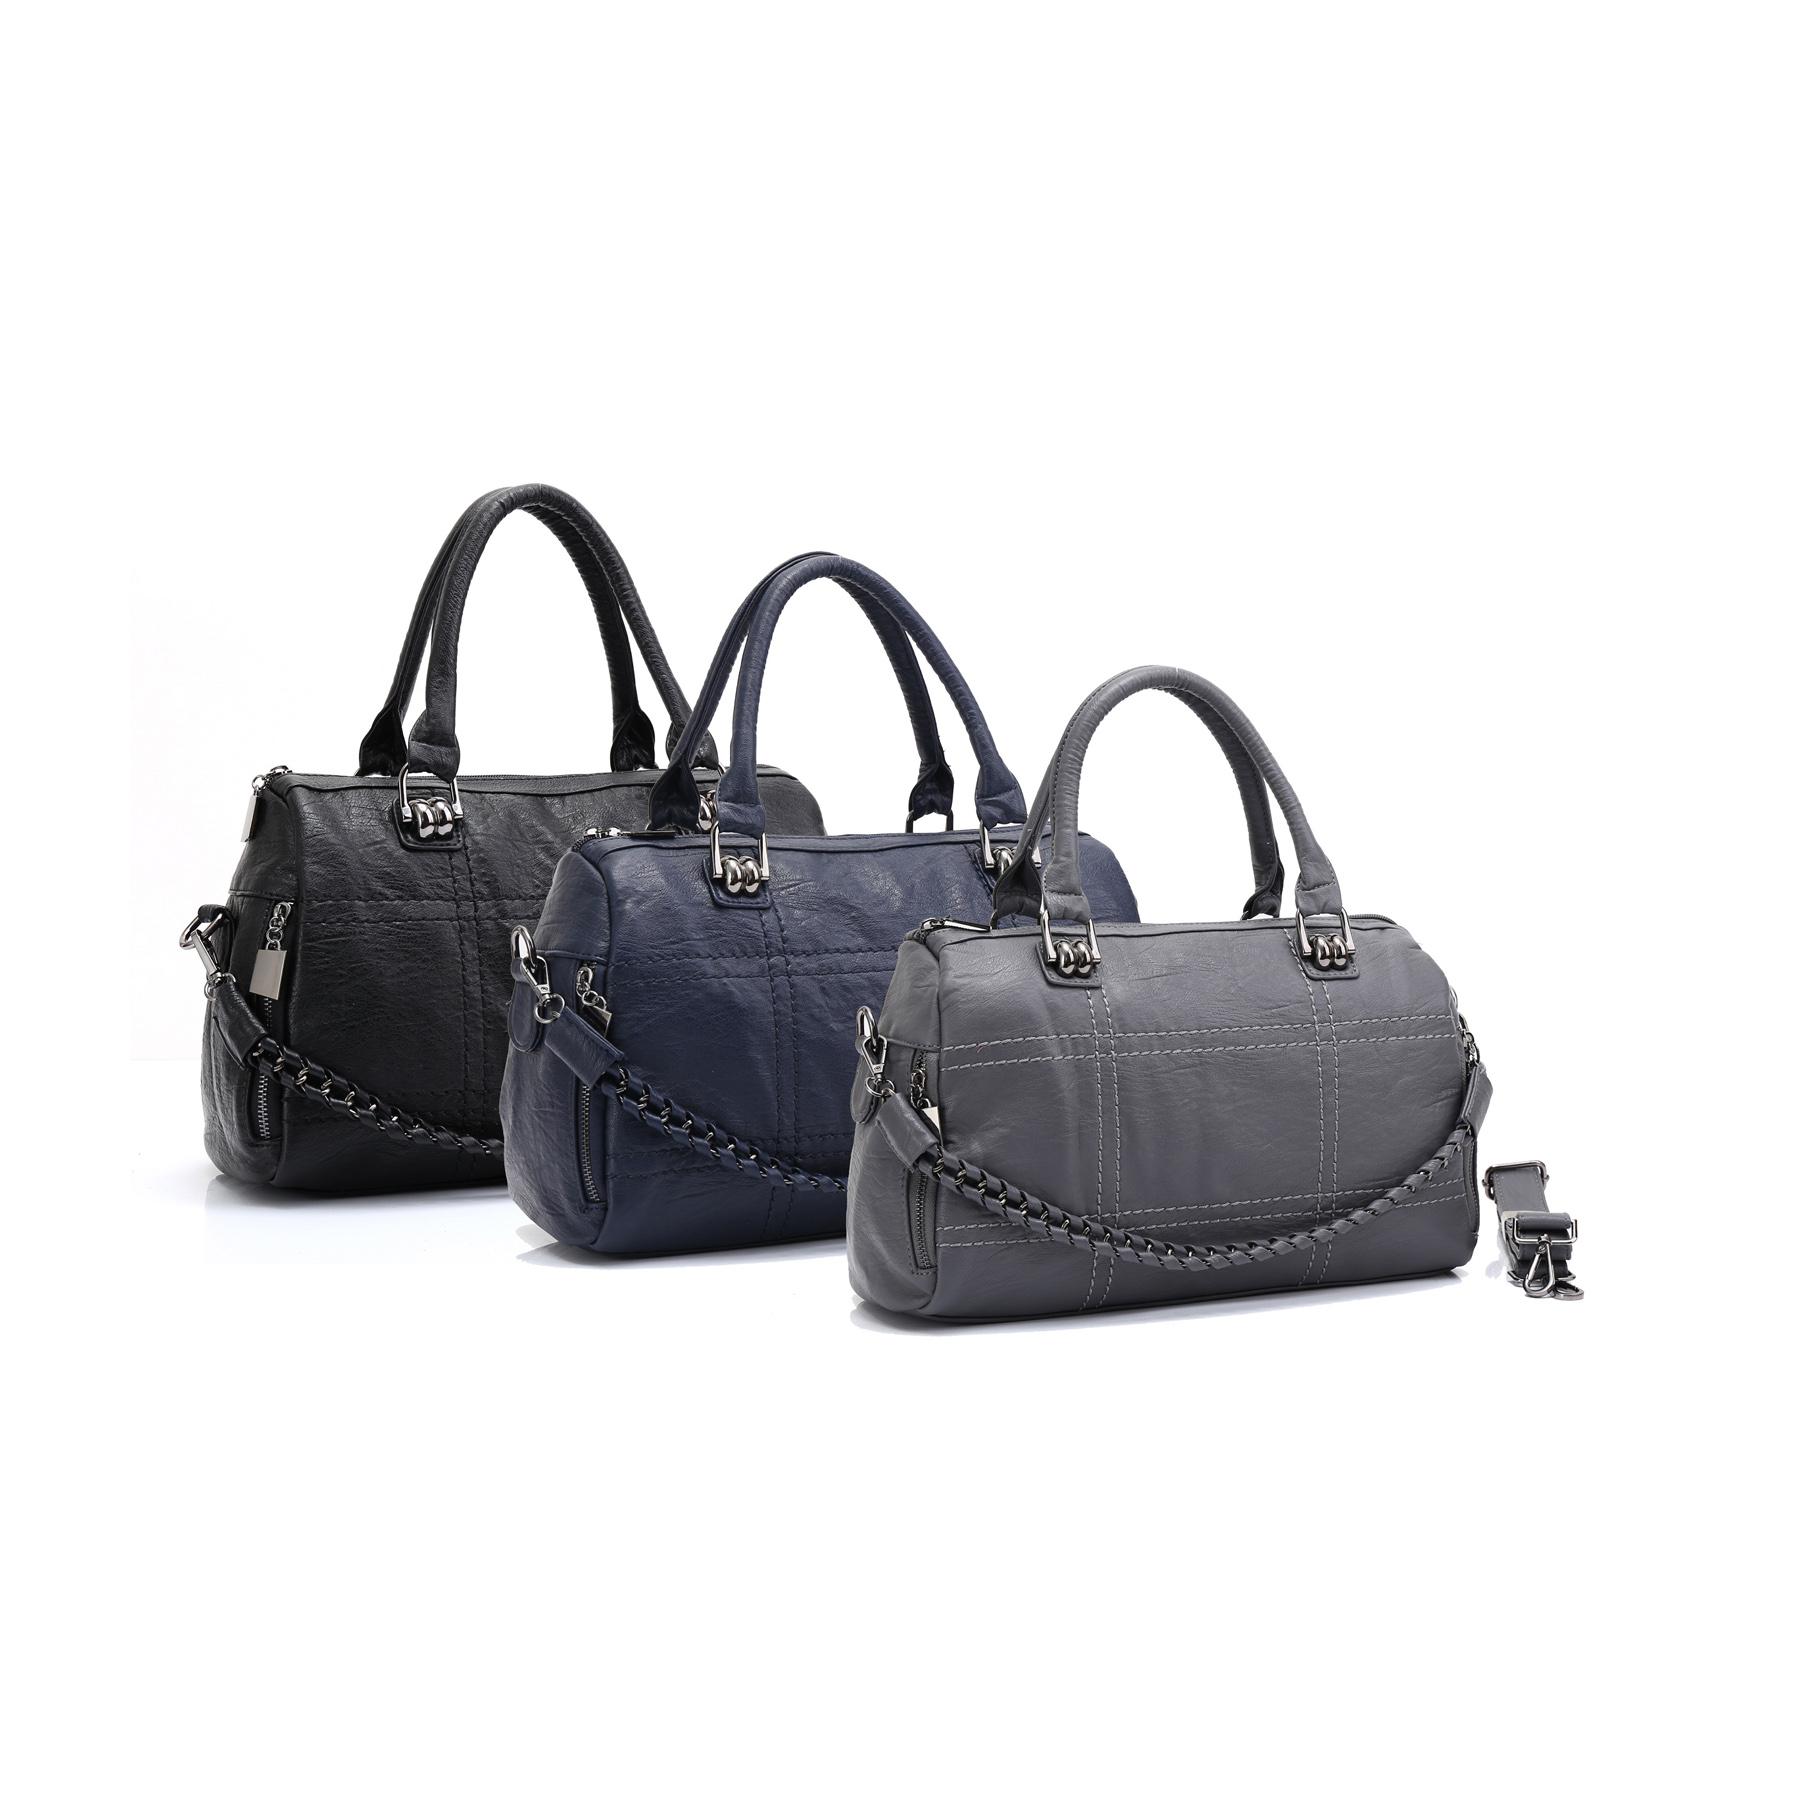 ffa1462218 HB-16080-silk-caress-designer-handbag-rectangular-cross-